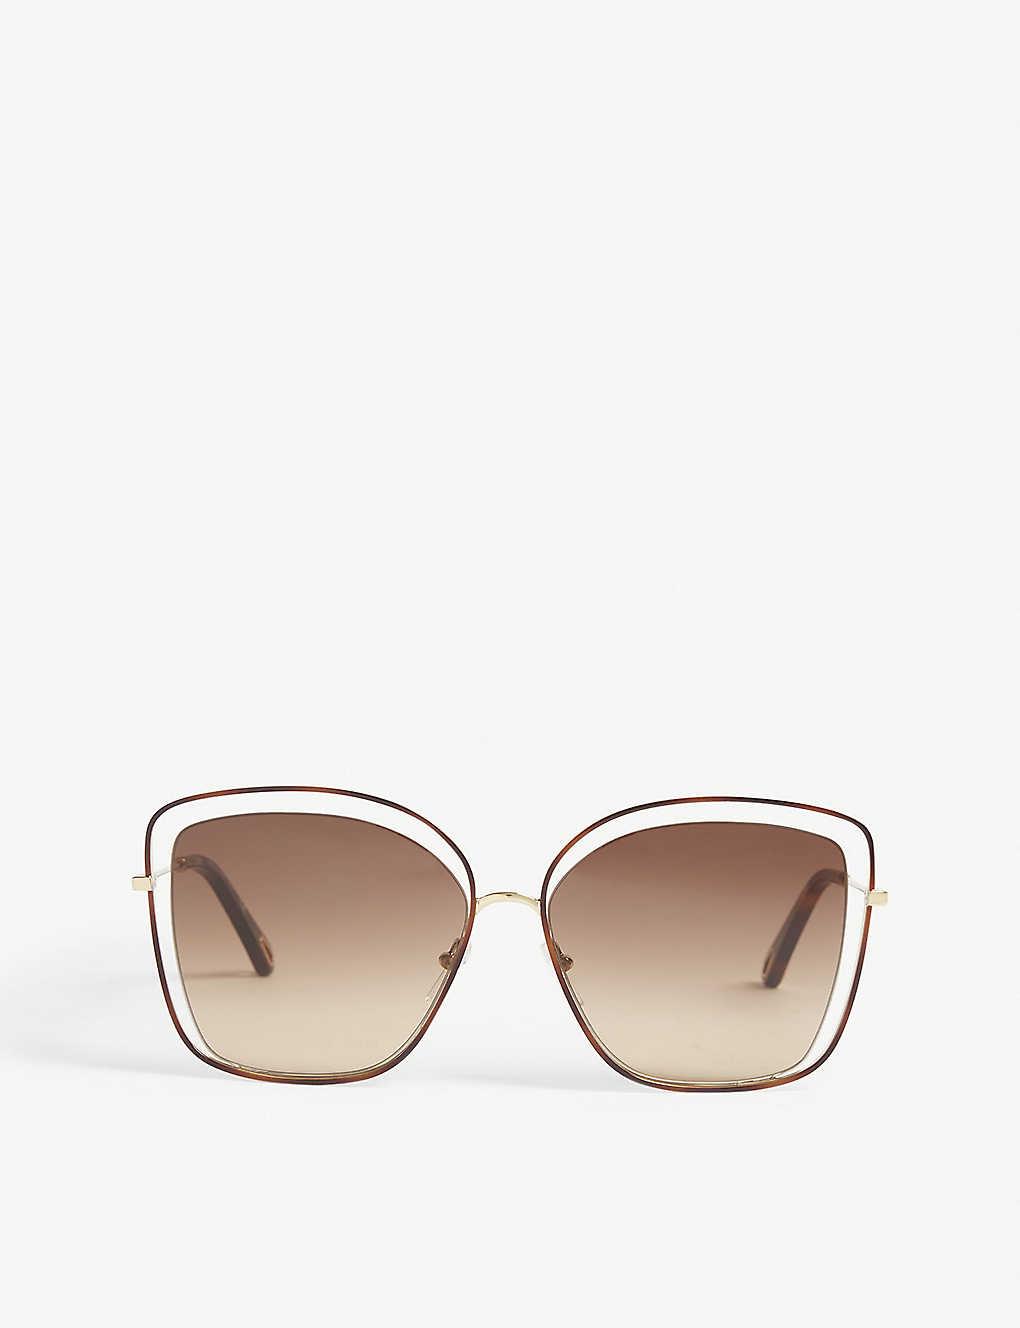 790914ab21 CHLOE - CE133S cat-eye-frame sunglasses